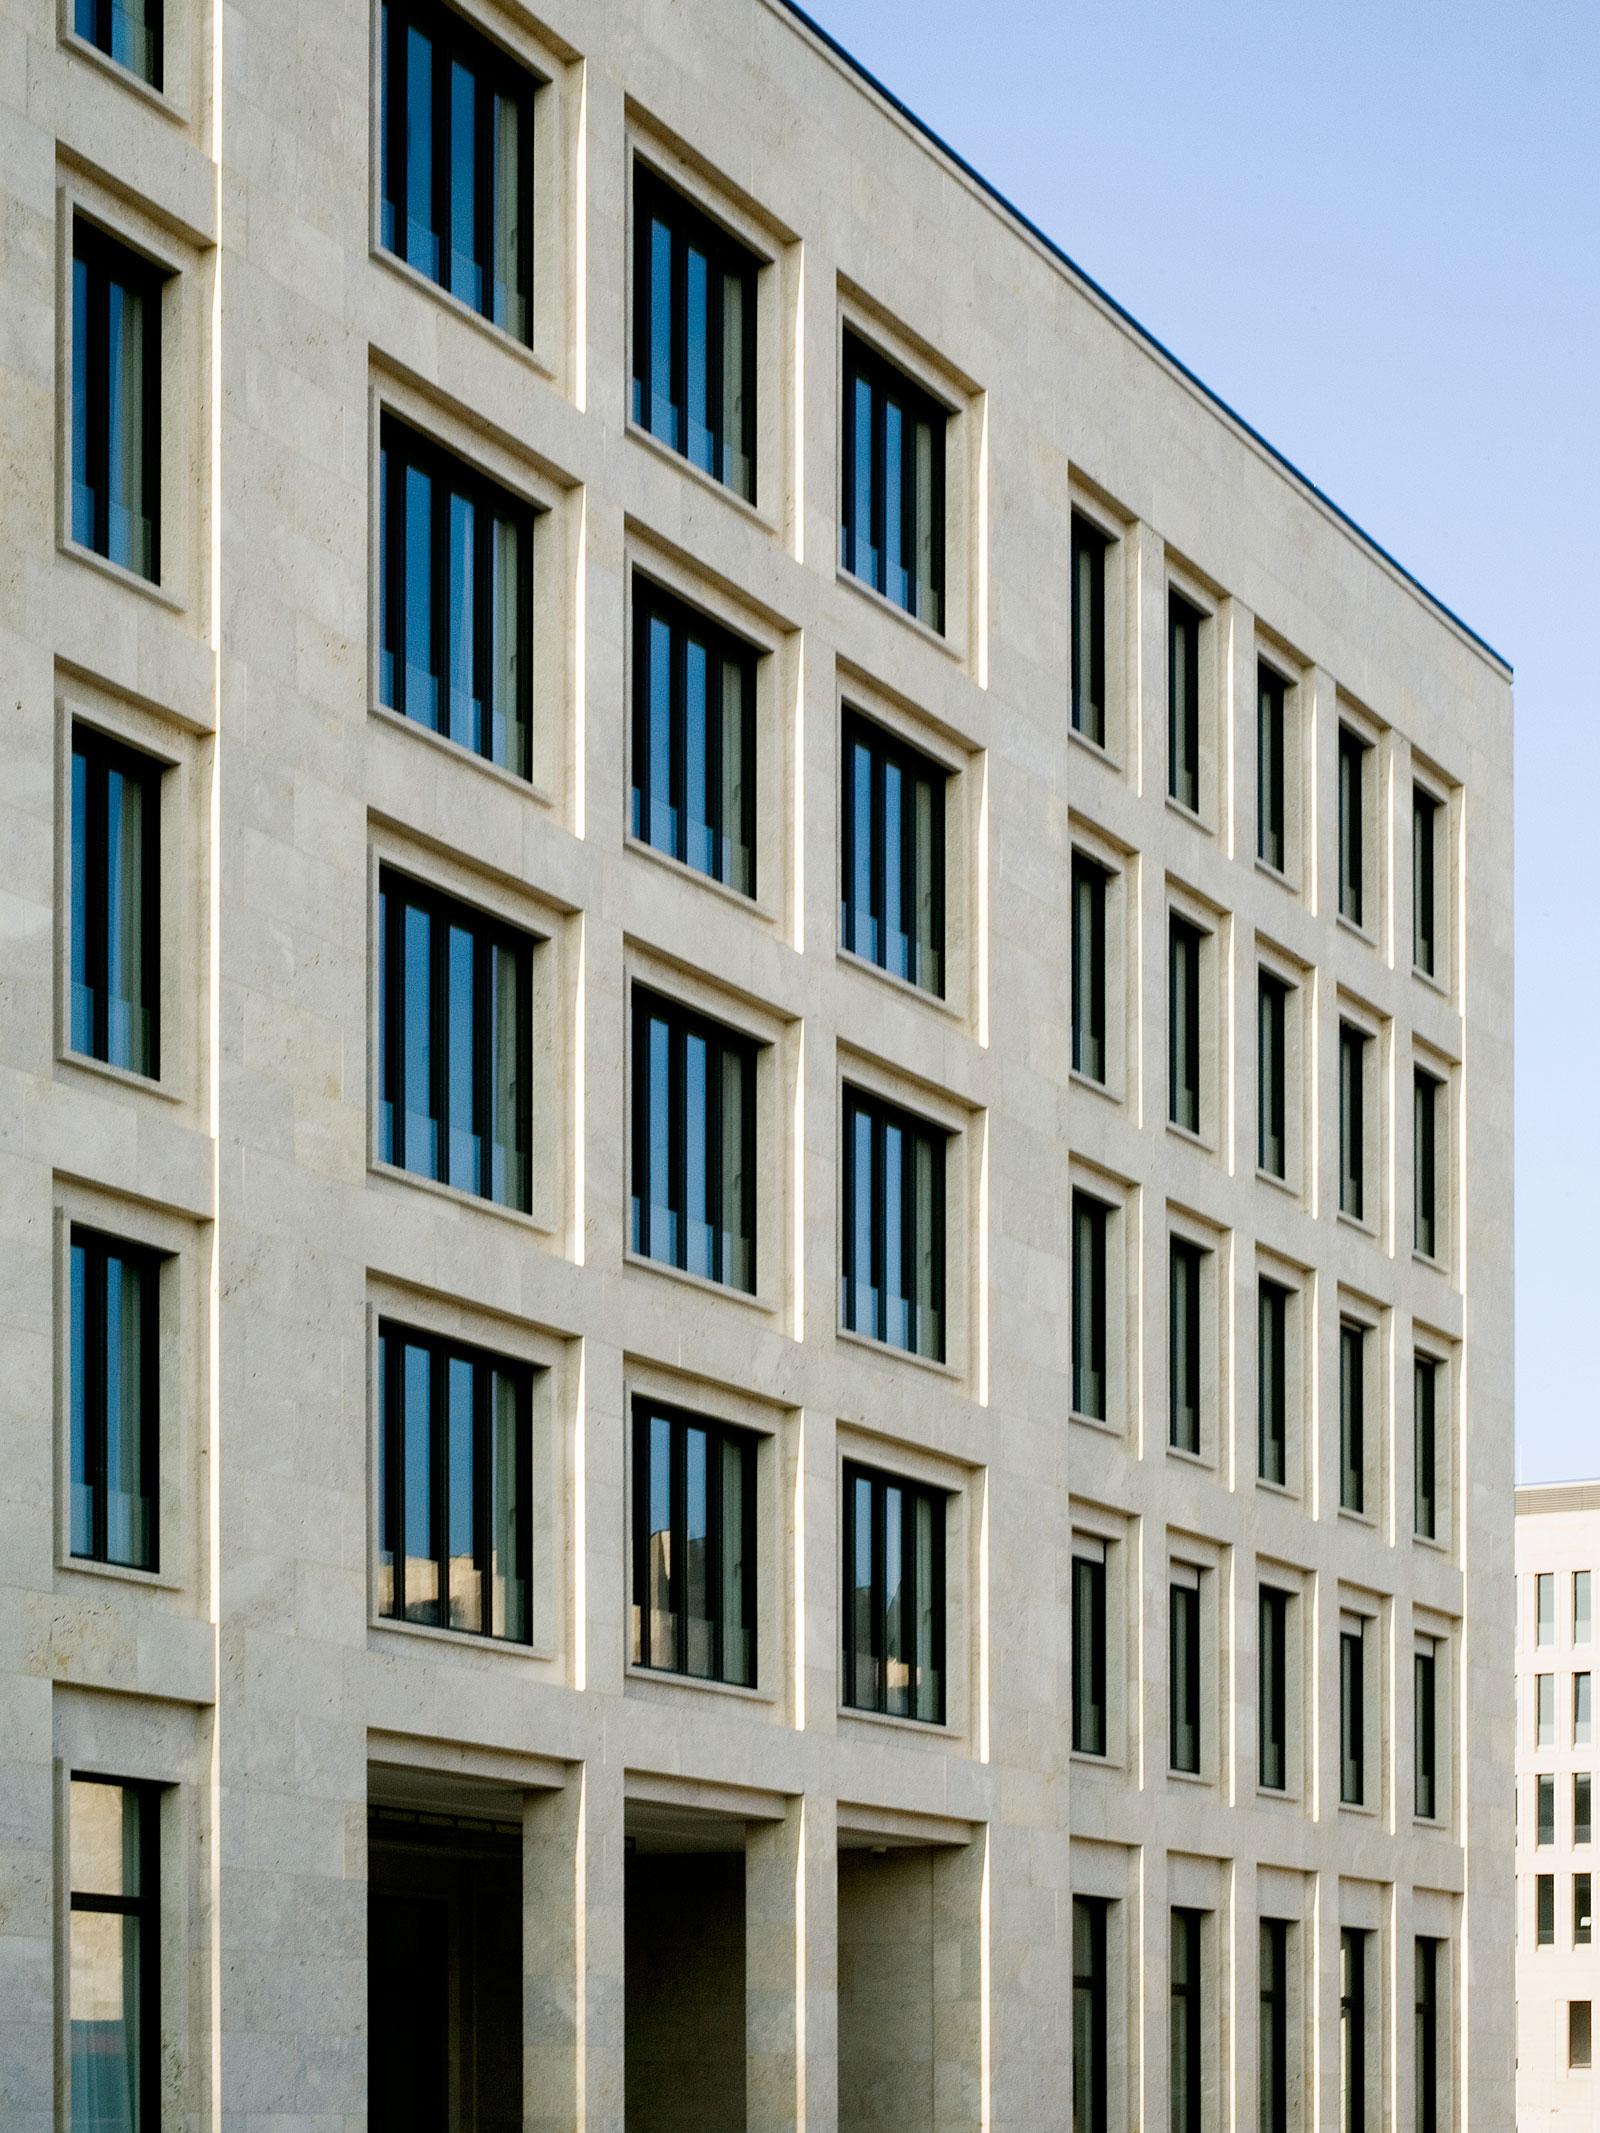 House of finance frankfurt am main references detail - Naturstein frankfurt ...